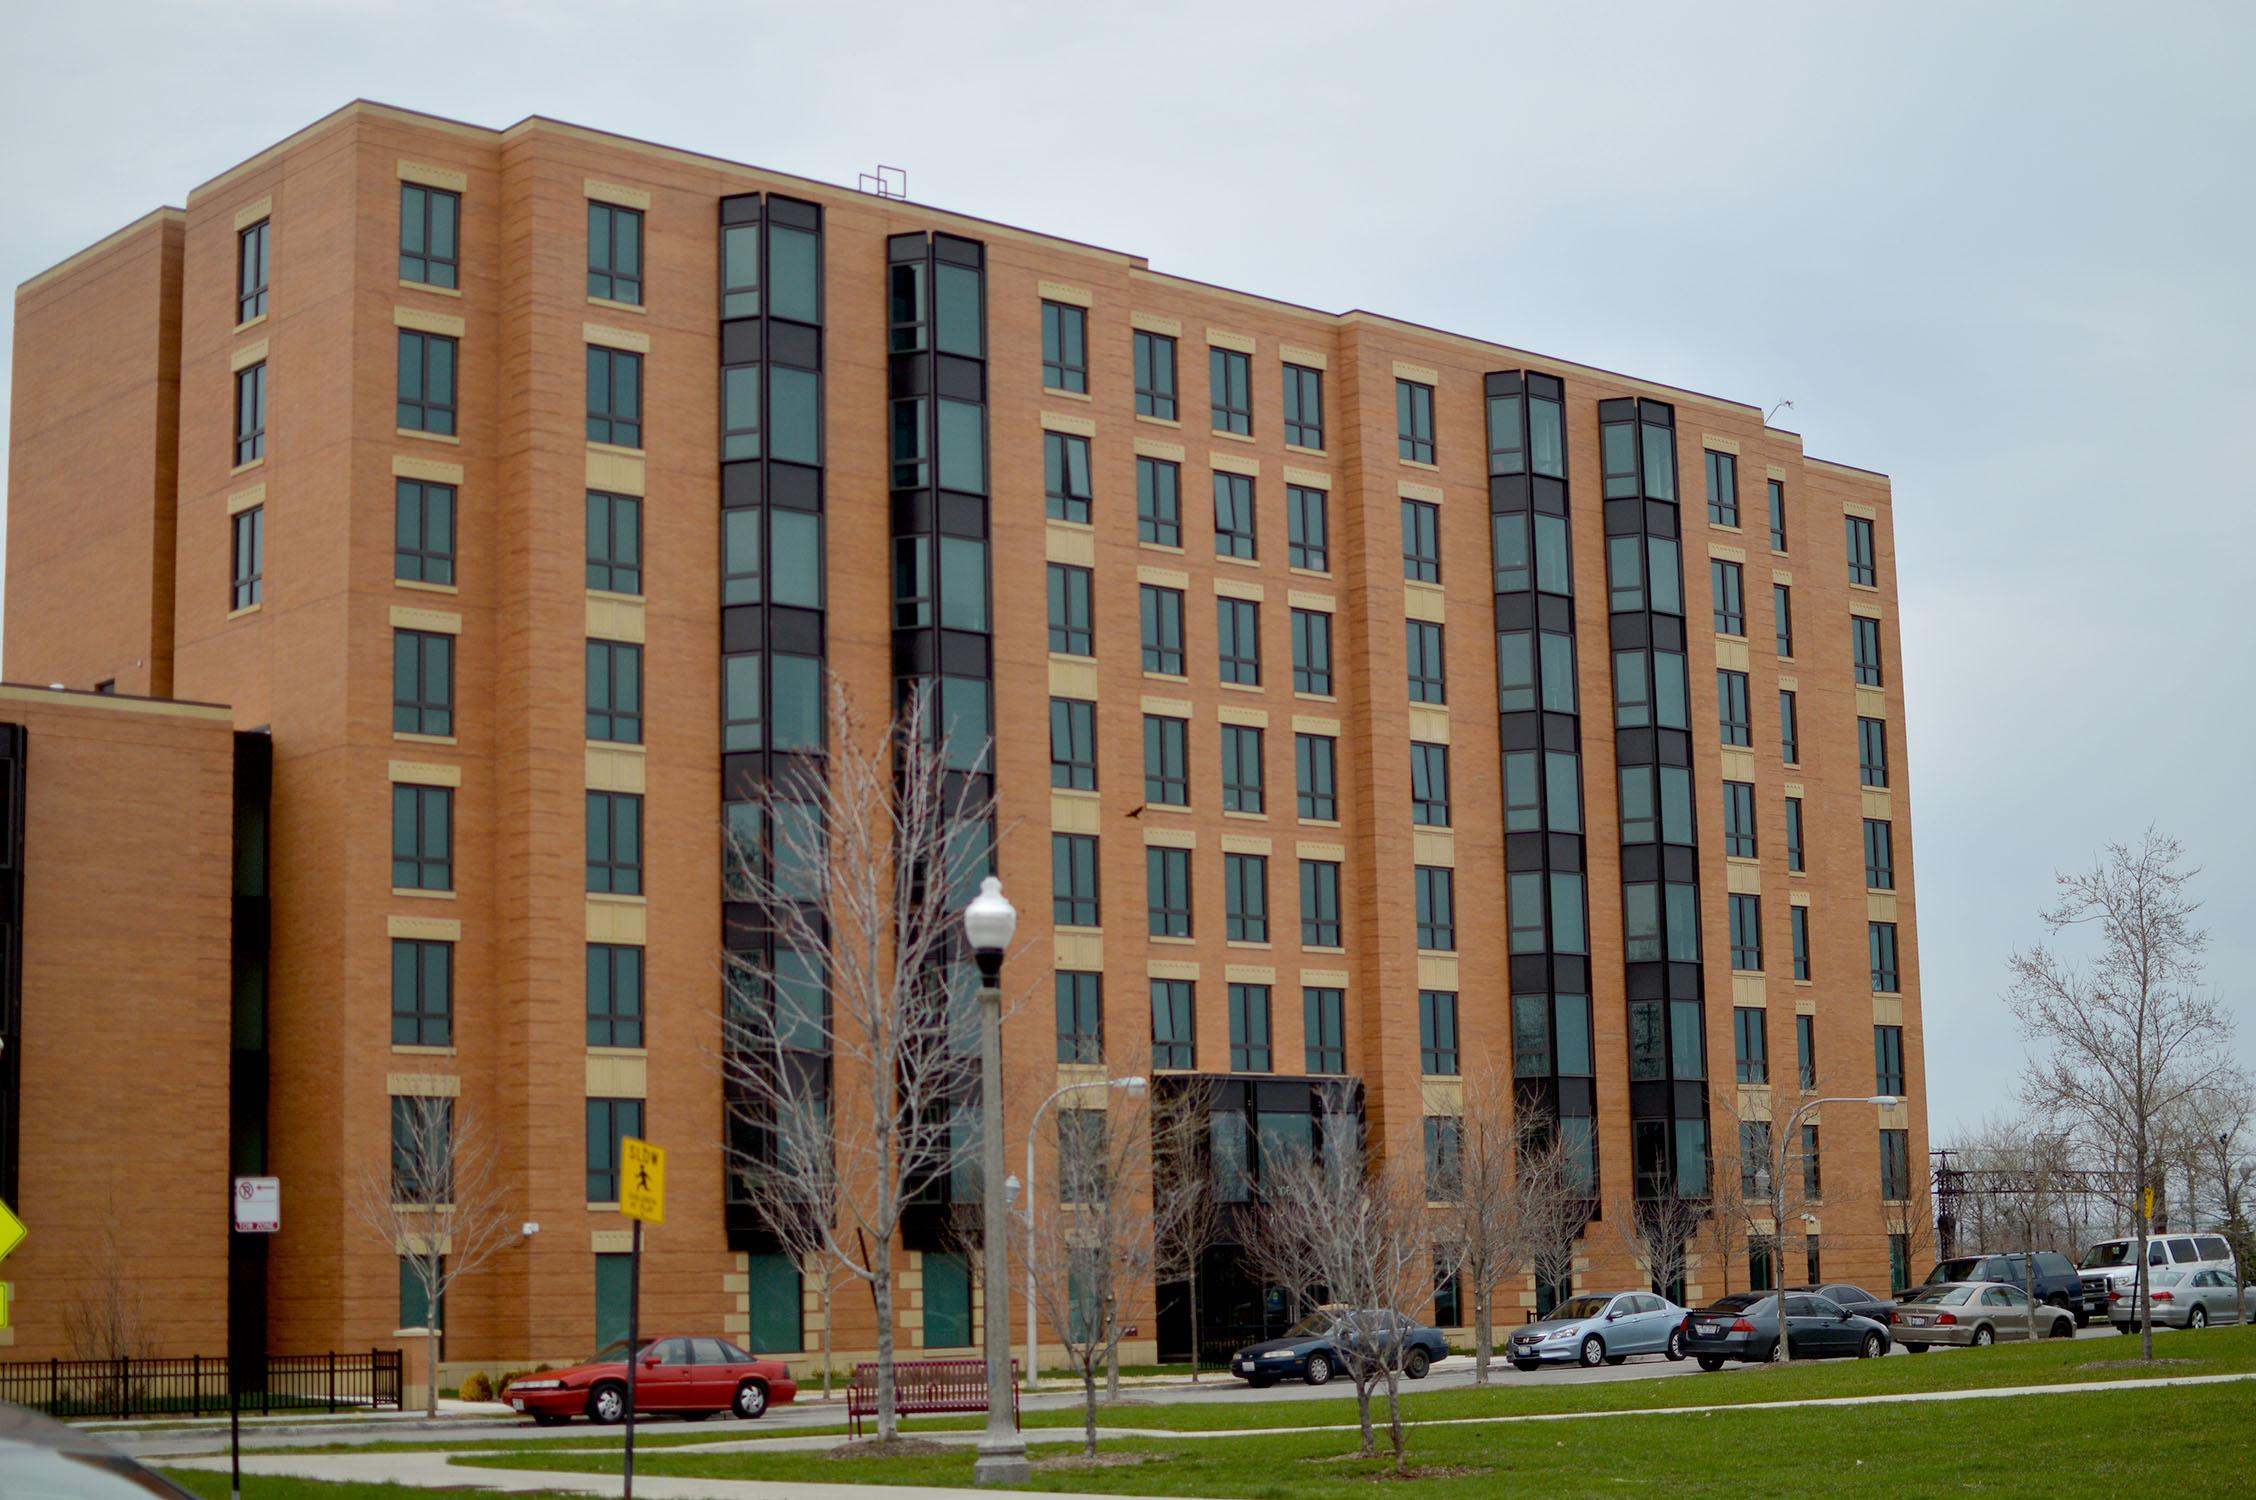 barlow building